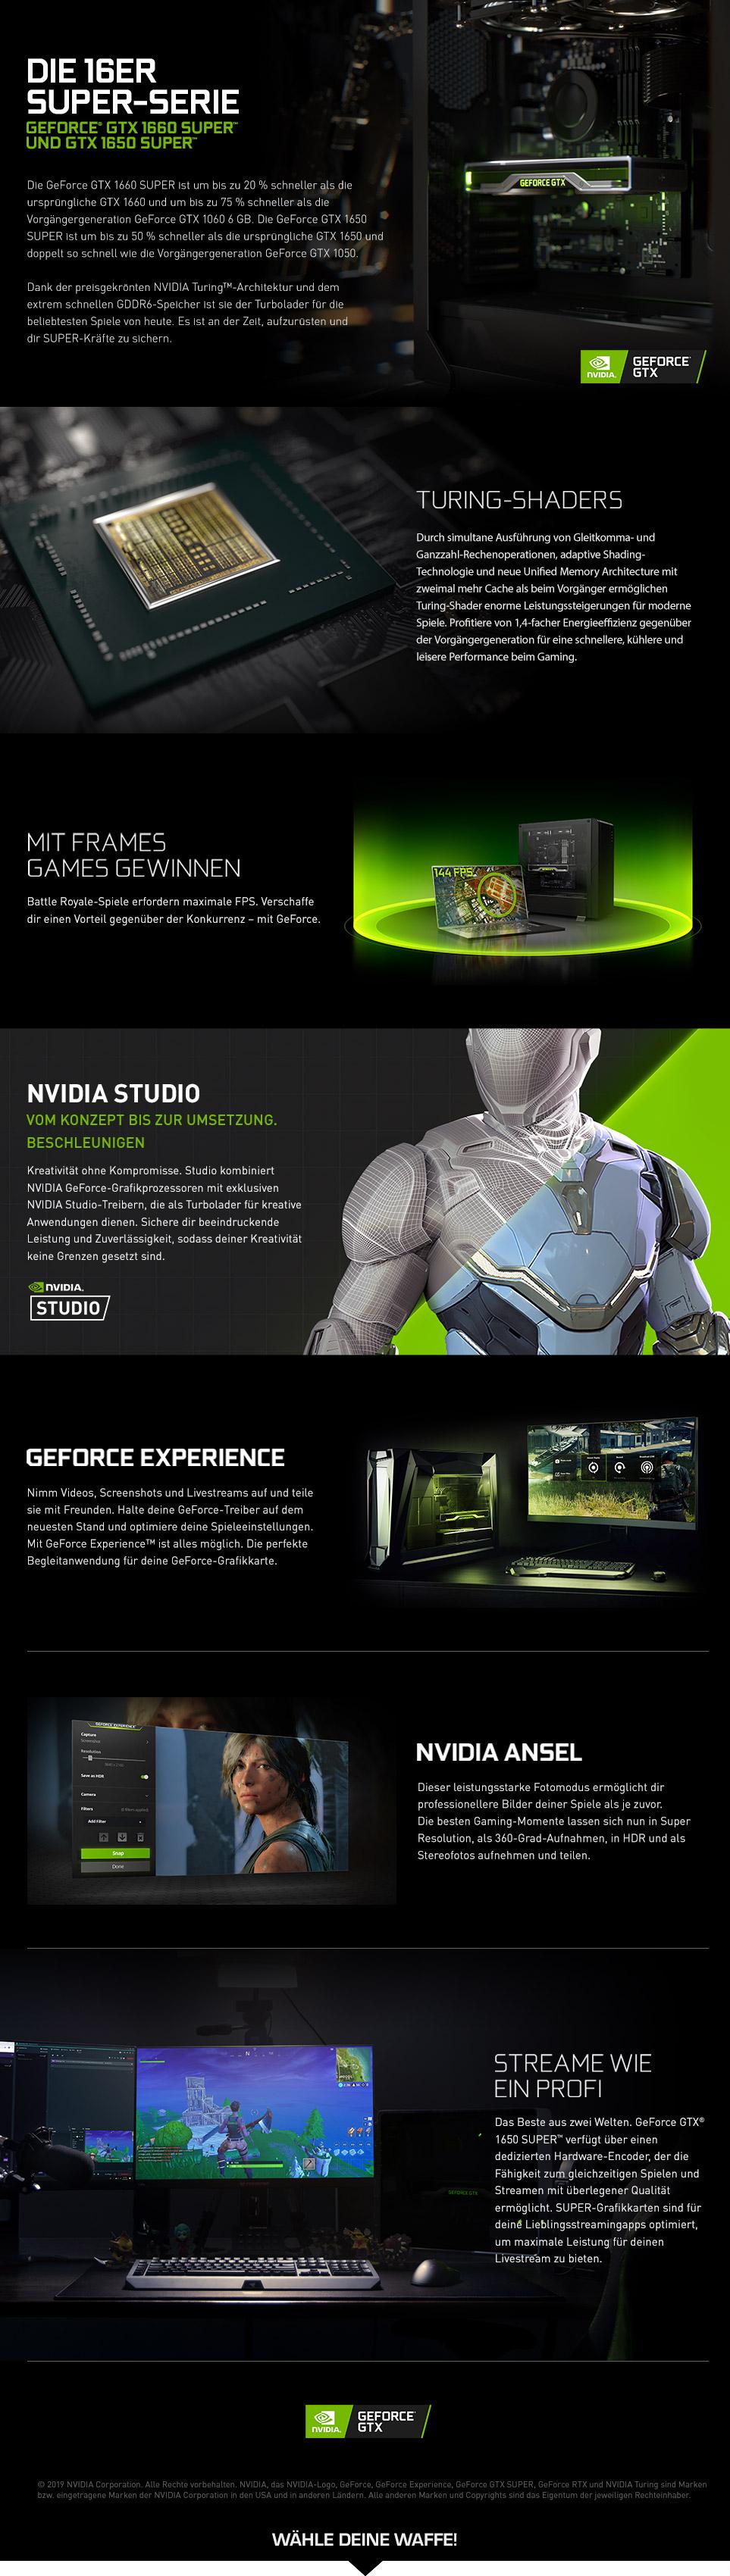 NVIDIA GeForce GTX 16 SUPER